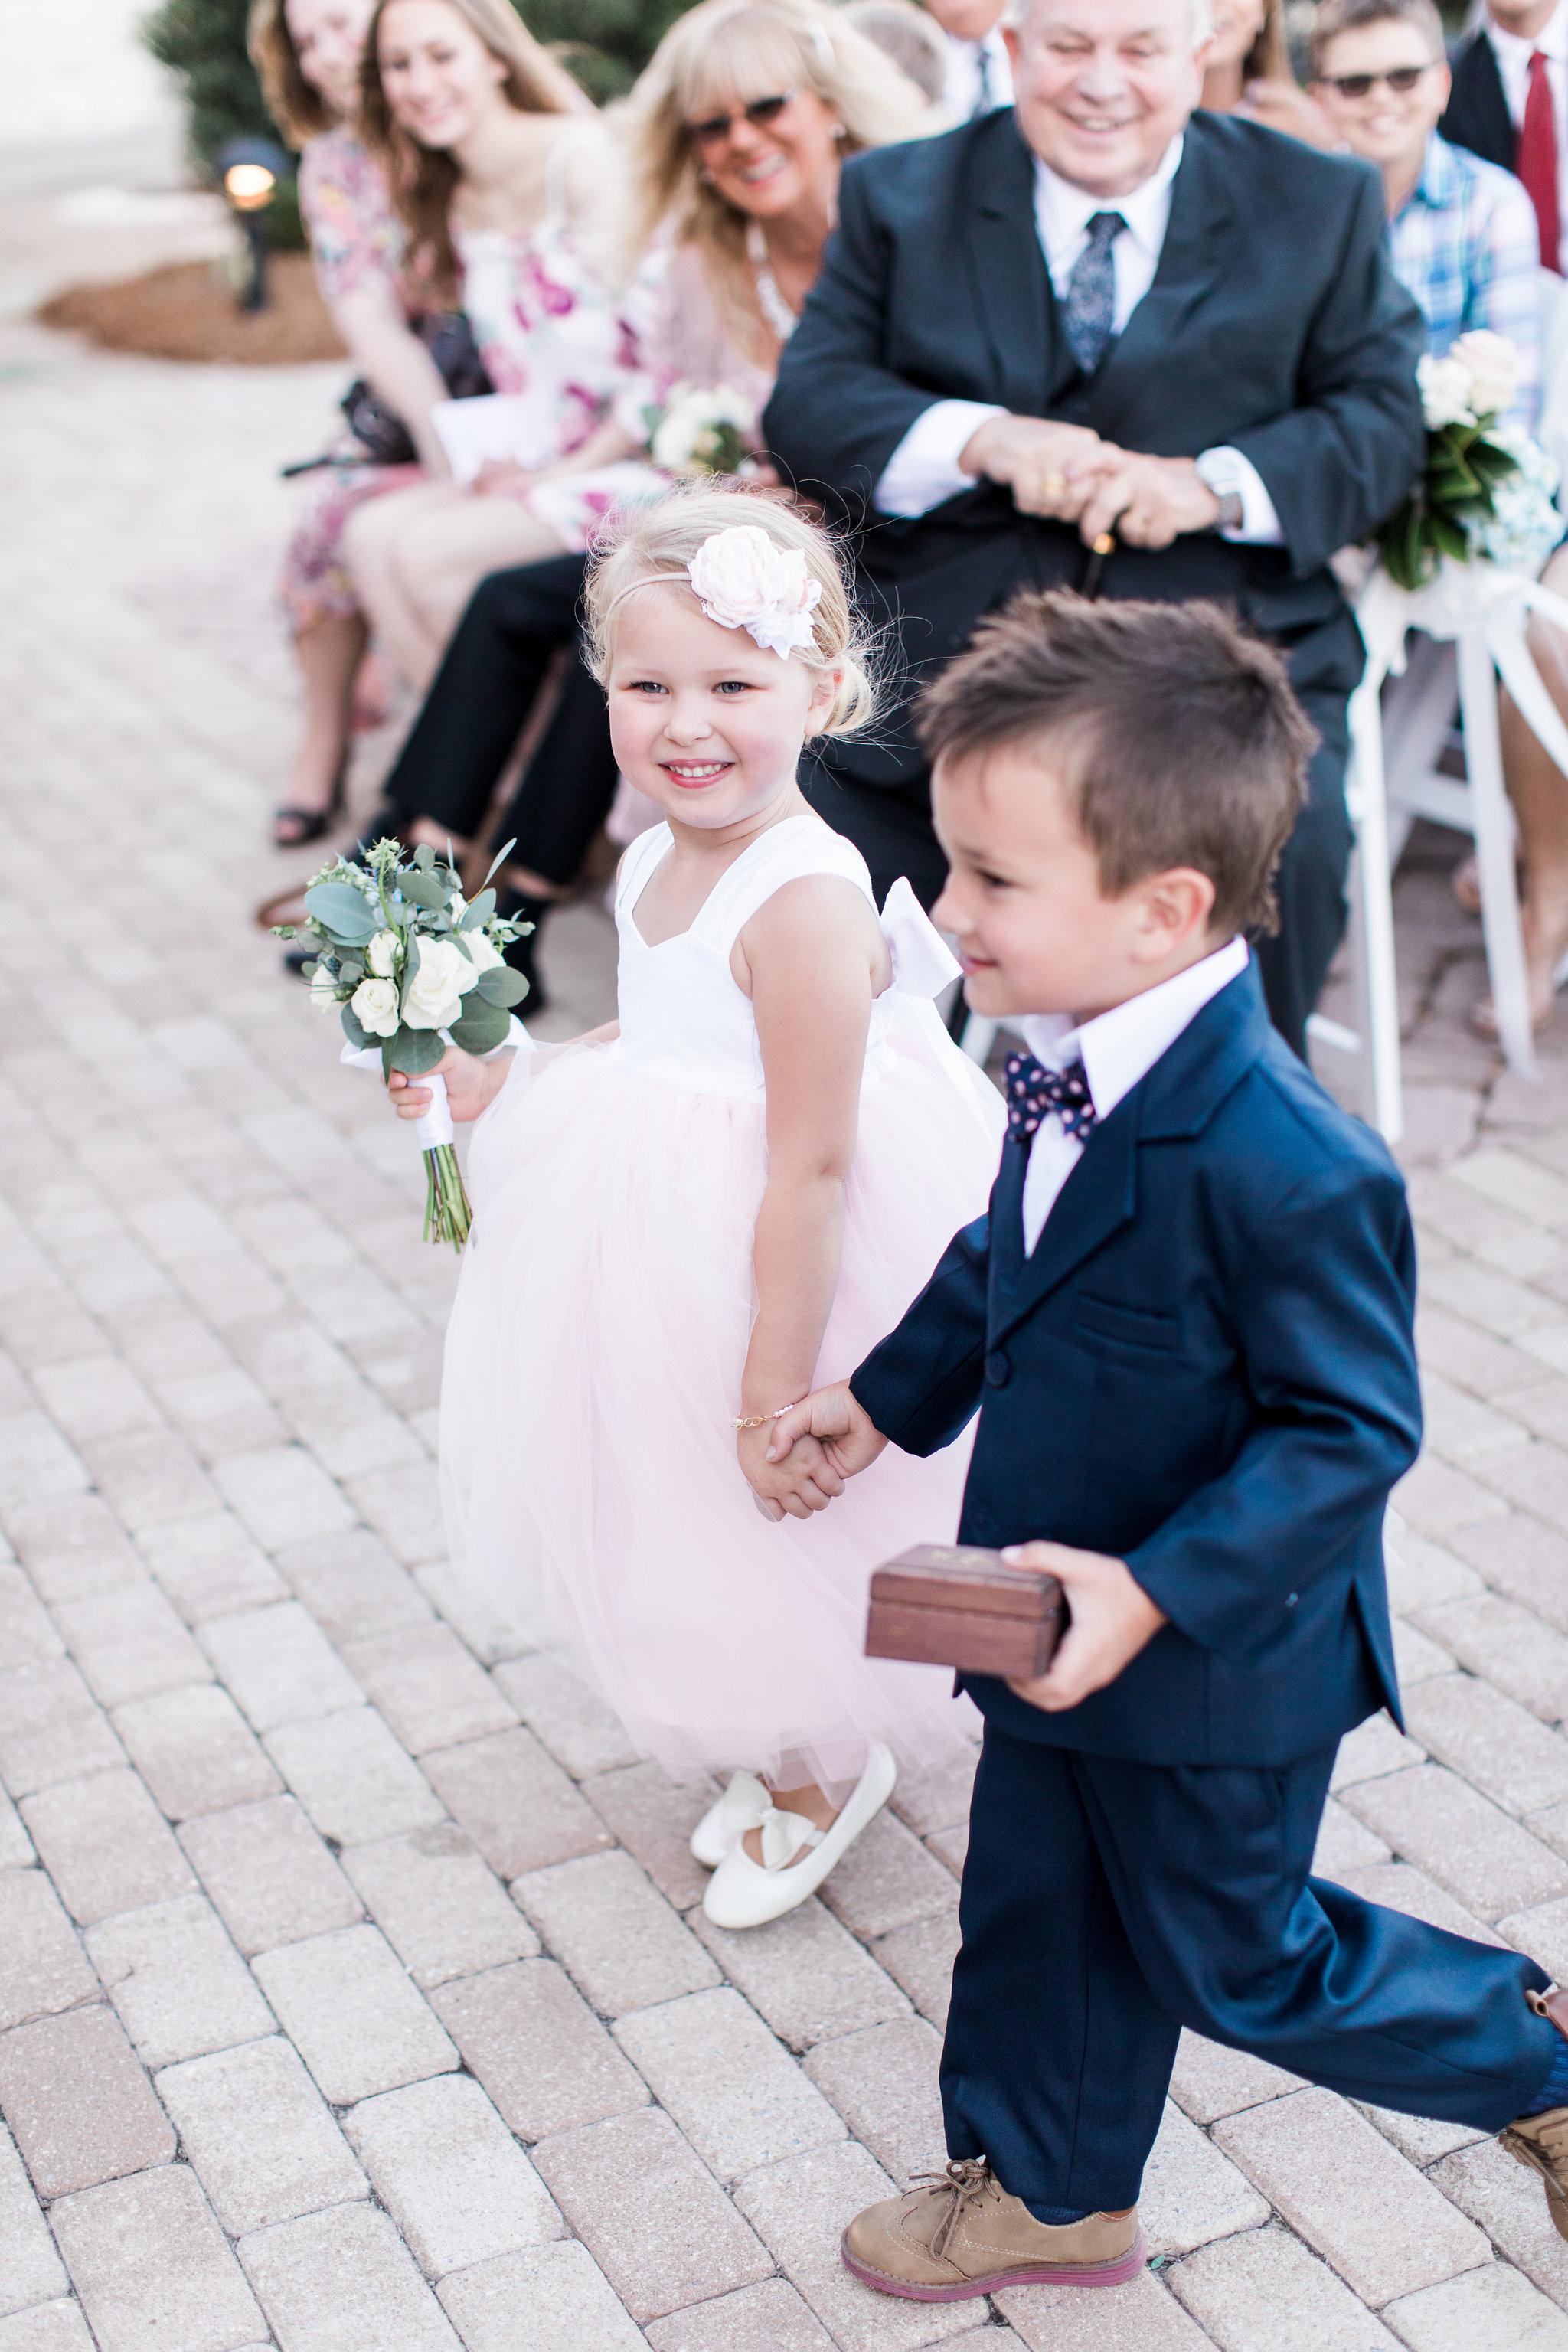 apt-b-photography-Savannah-wedding-photographer-savannah-engagement-photographer-historic-savannah-engagement-charles-h-morris-center-wedding-savannah-weddings-36.JPG